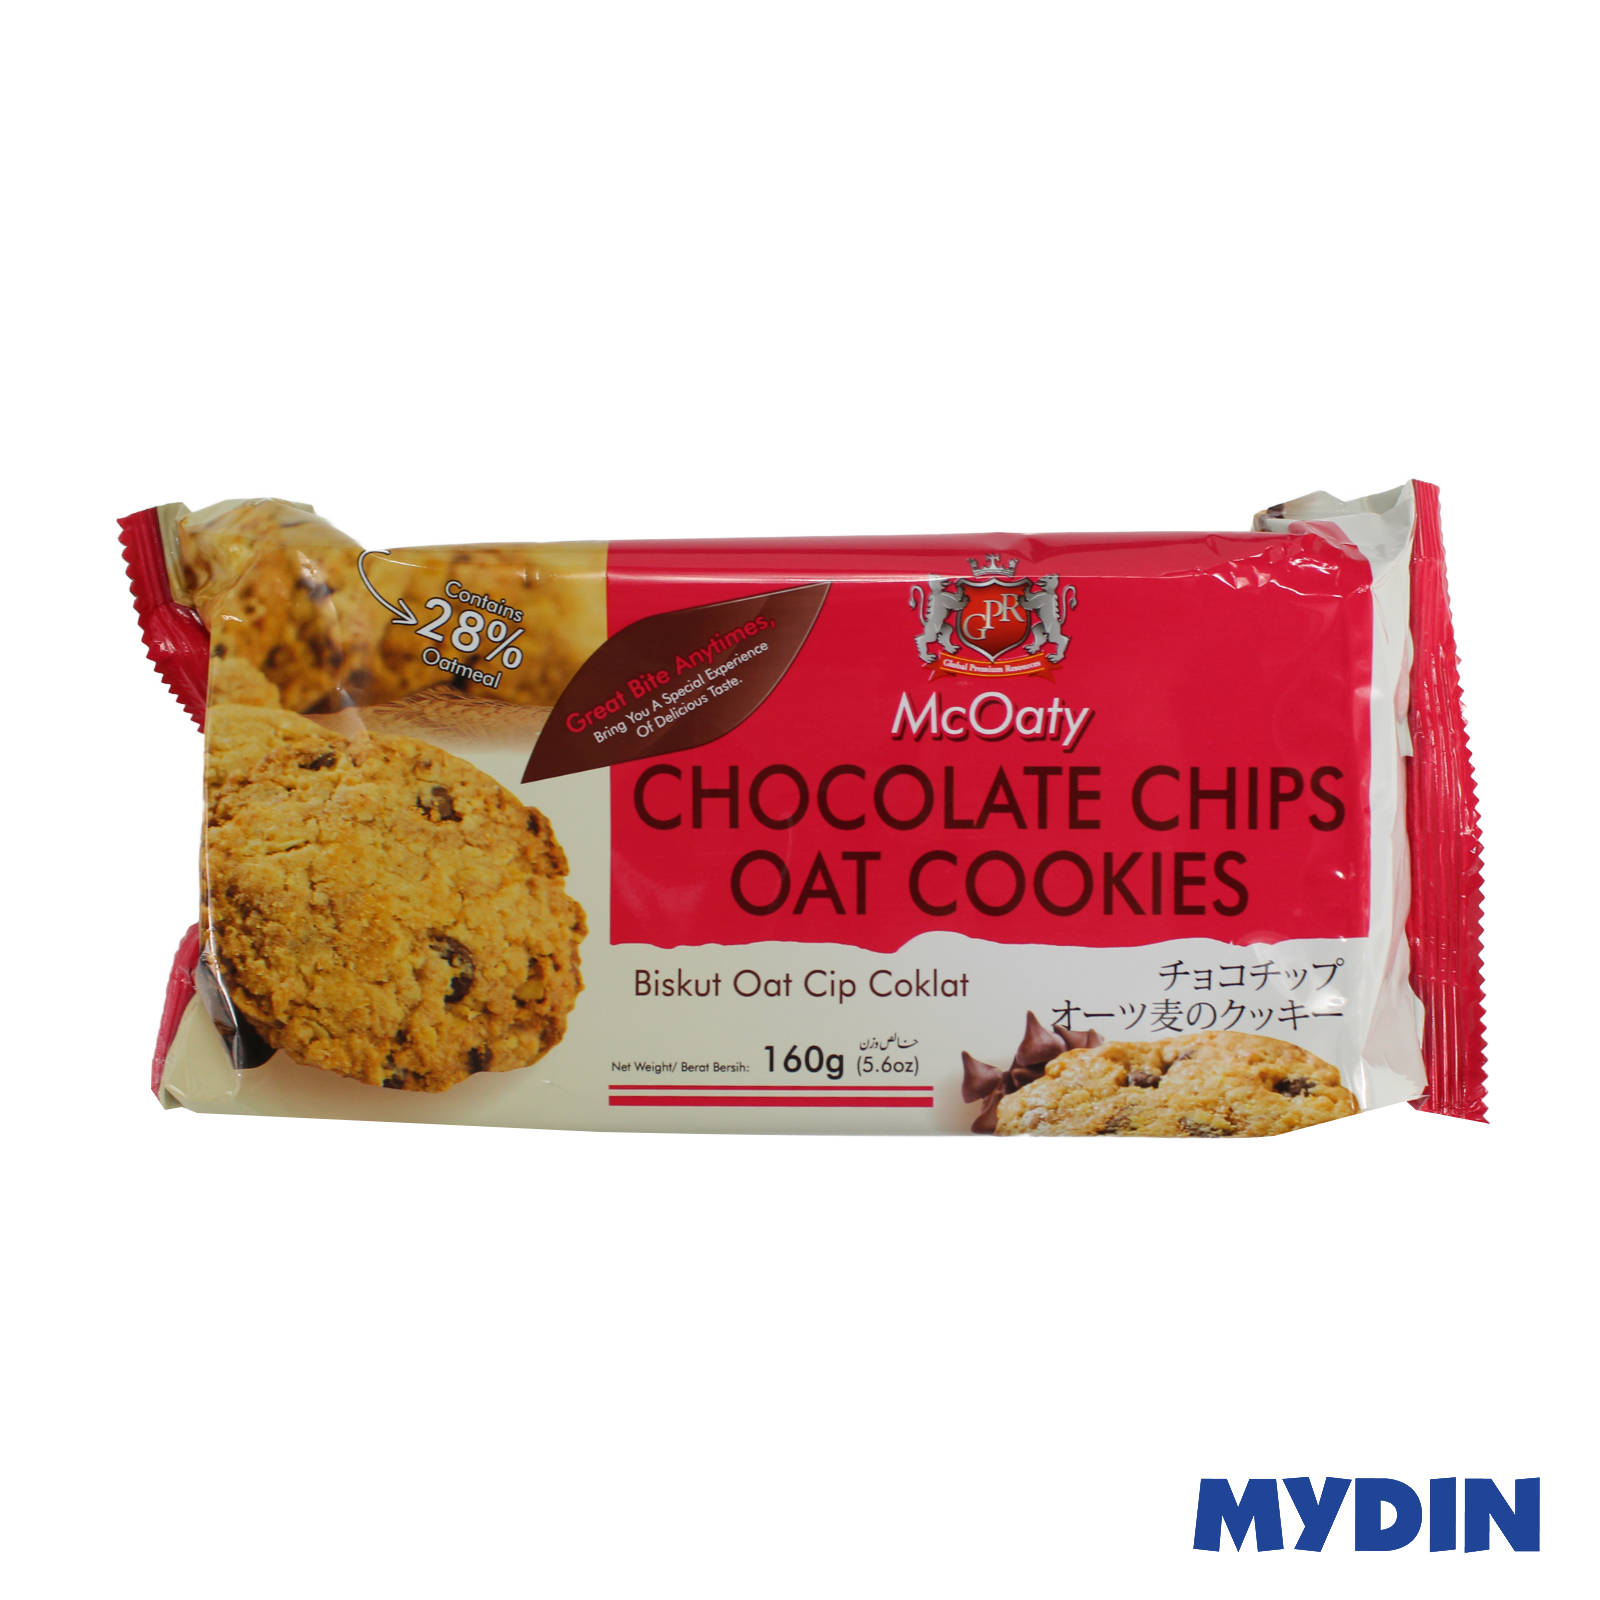 GPR McOaty Chocolate Chips Oat Cookies 160g